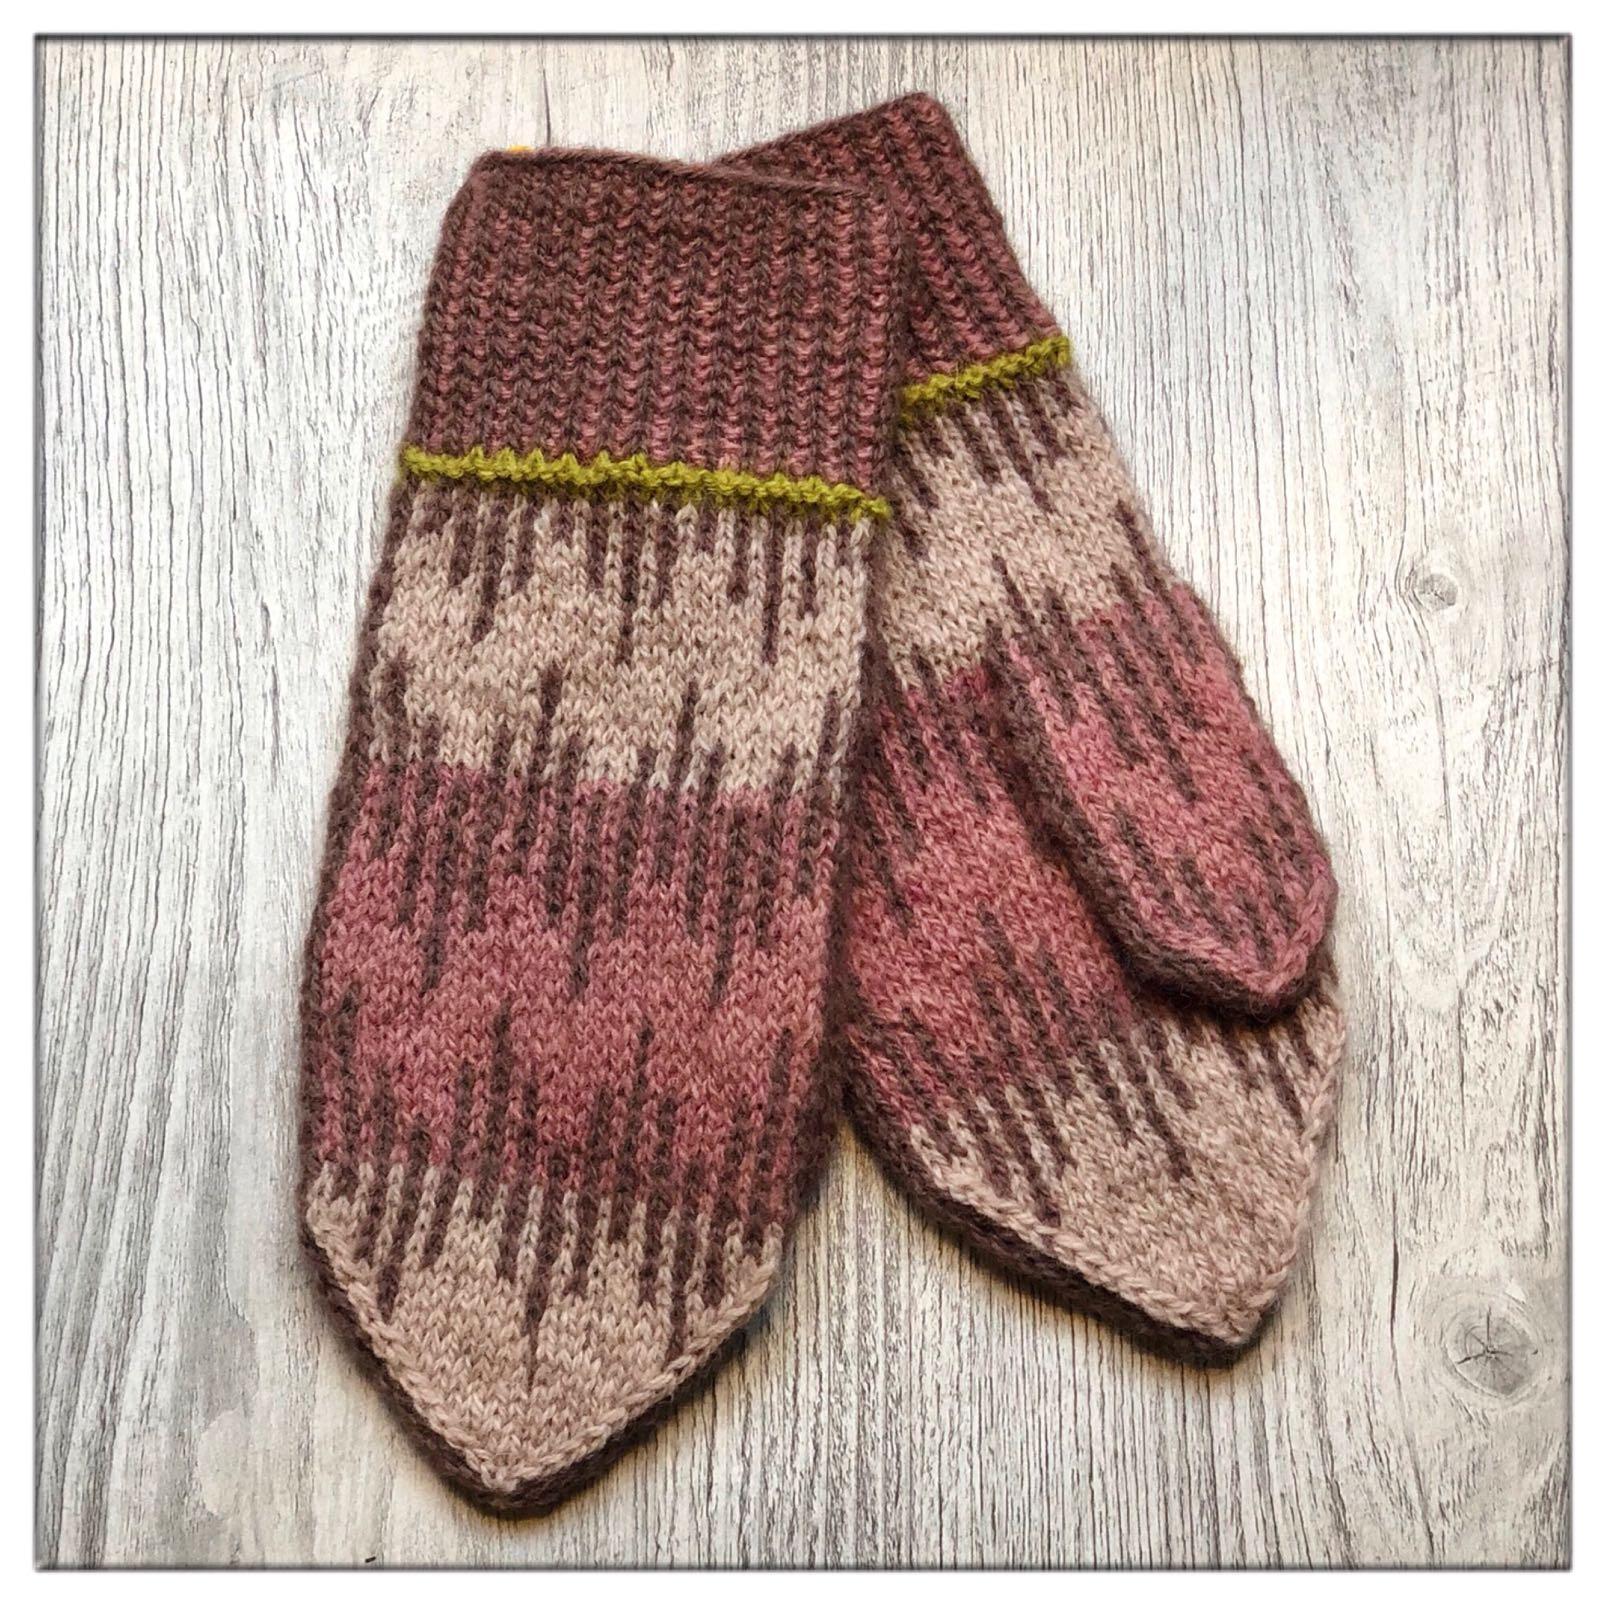 Hand-dyed & hand-knitted organic mittens by Vladanka for Kaya Originals